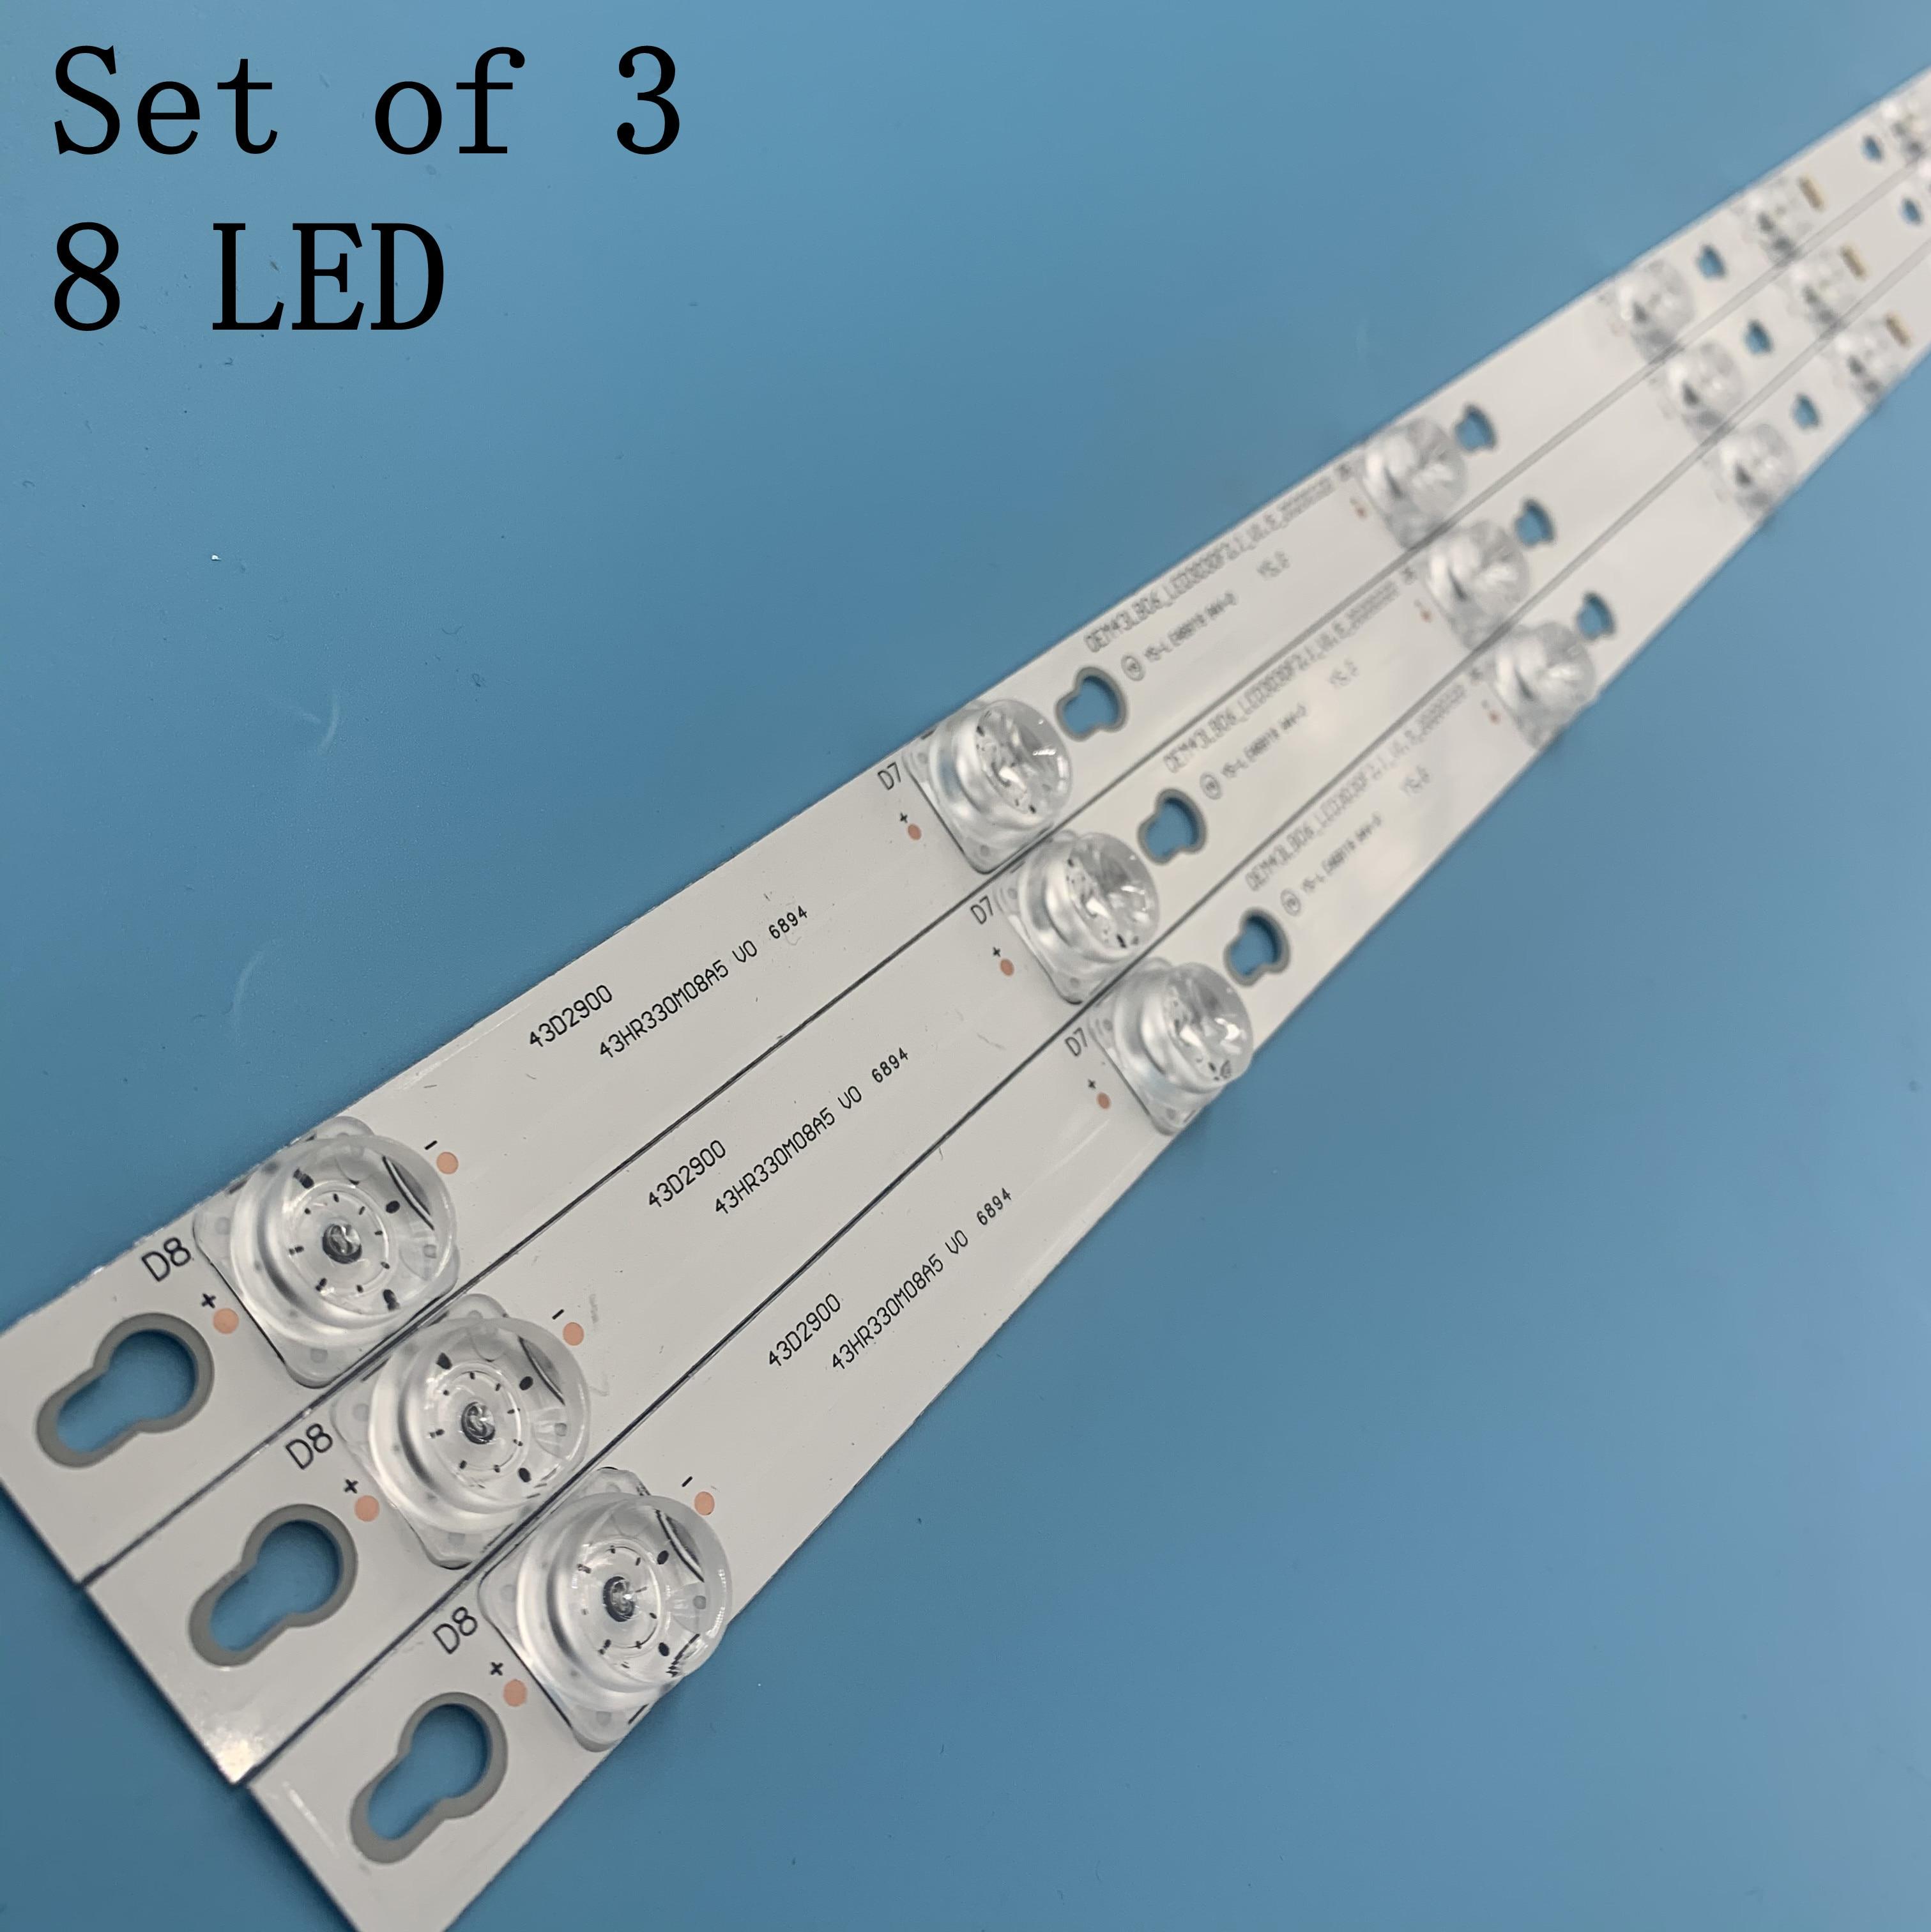 TCL D43A810 U43P6046 Led Backlight L43P1-F 4C-LB4308-ZM02J TOT_43D2900_3X8_3030C_d6t-2d1_4S1PX2 Rev.V2 TV 8 Lamps 6V